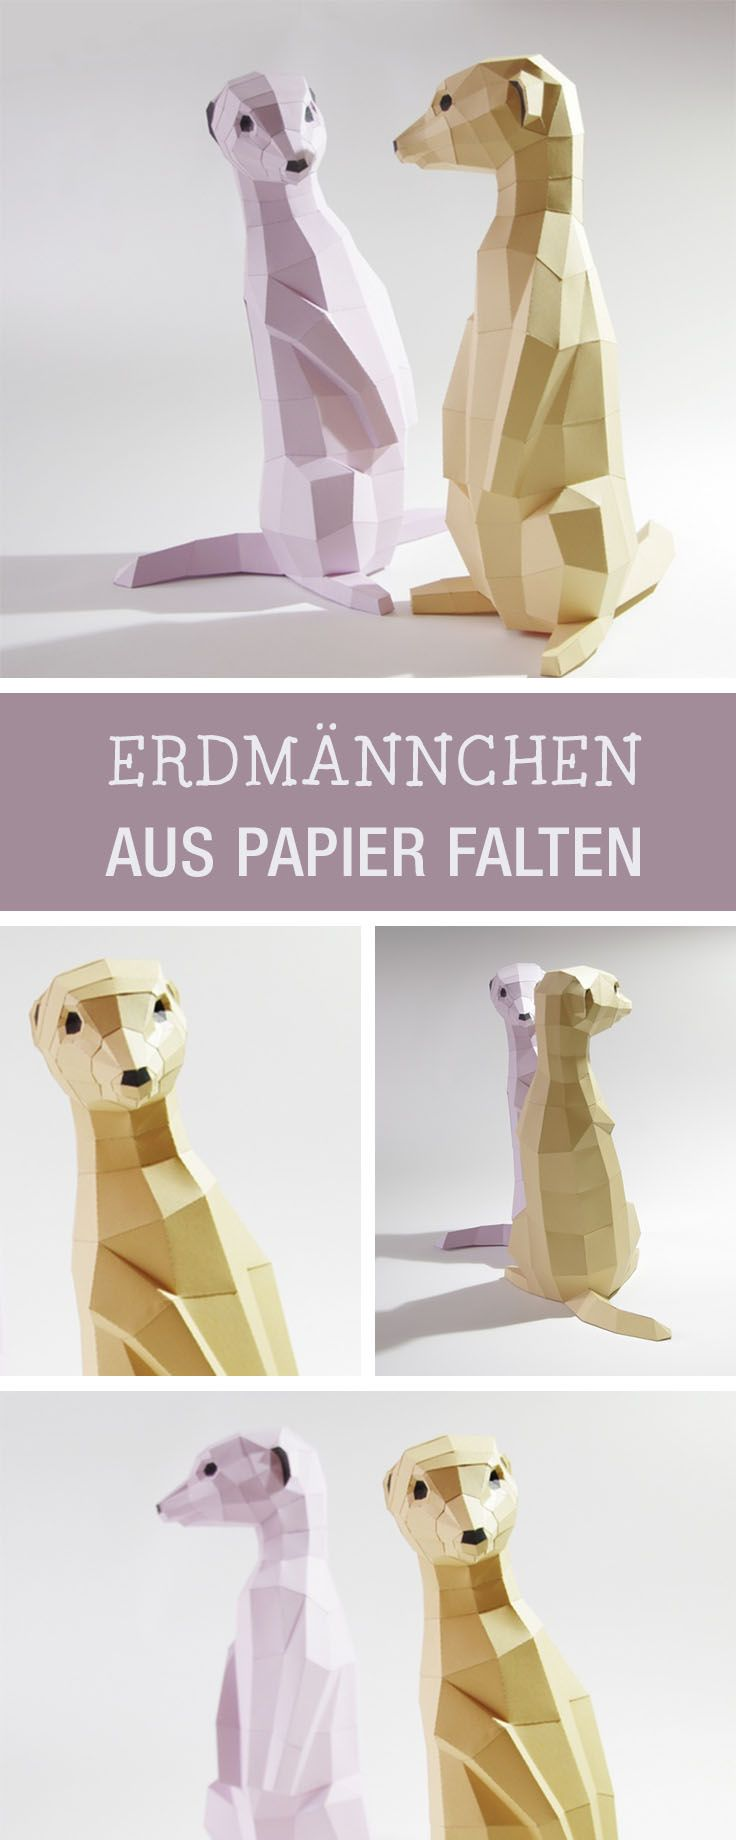 Anleitung für Erdmännchen im Origami-Stil gefaltet / diy tutorial for origami folded paper animals via DaWanda.com